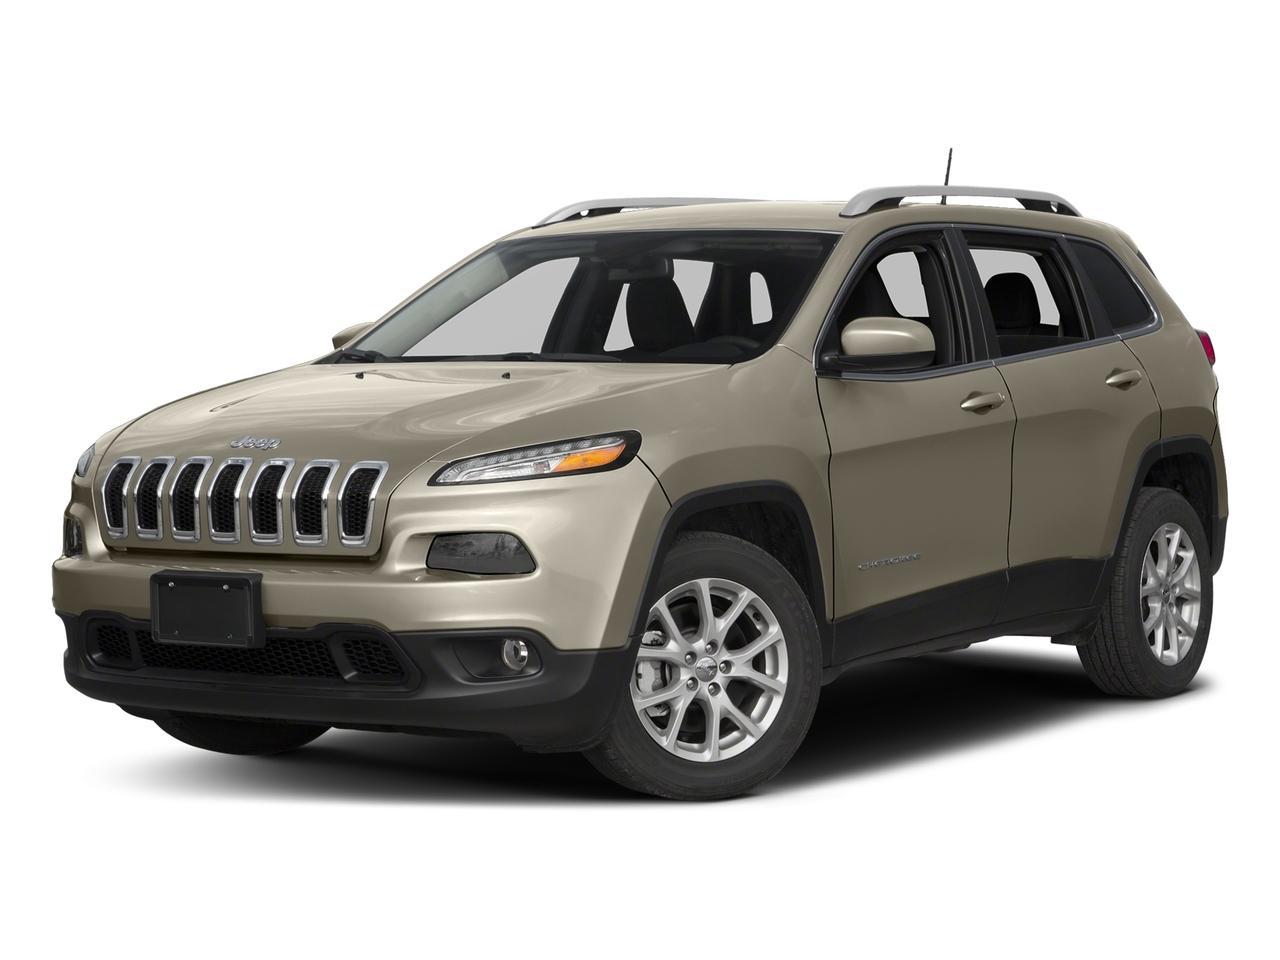 2016 Jeep Cherokee Vehicle Photo in Williamsville, NY 14221